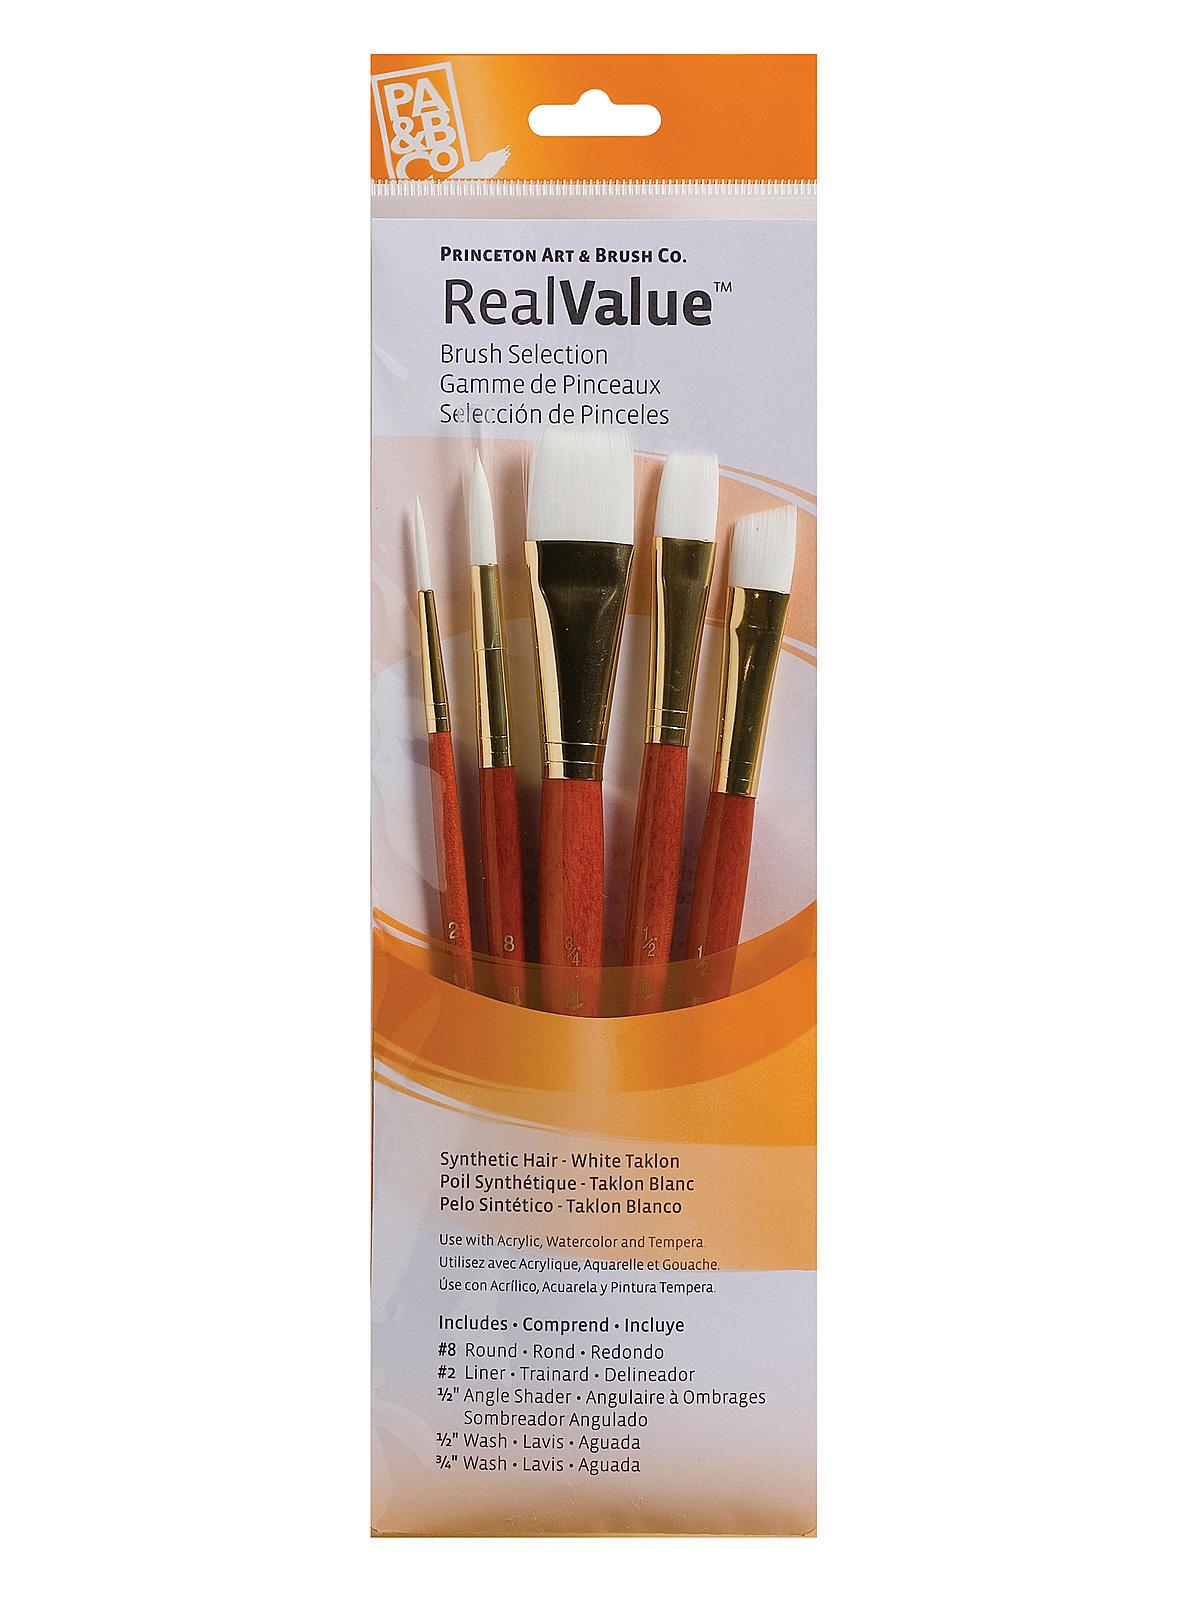 Real Value Series Orange Handled Brush Sets